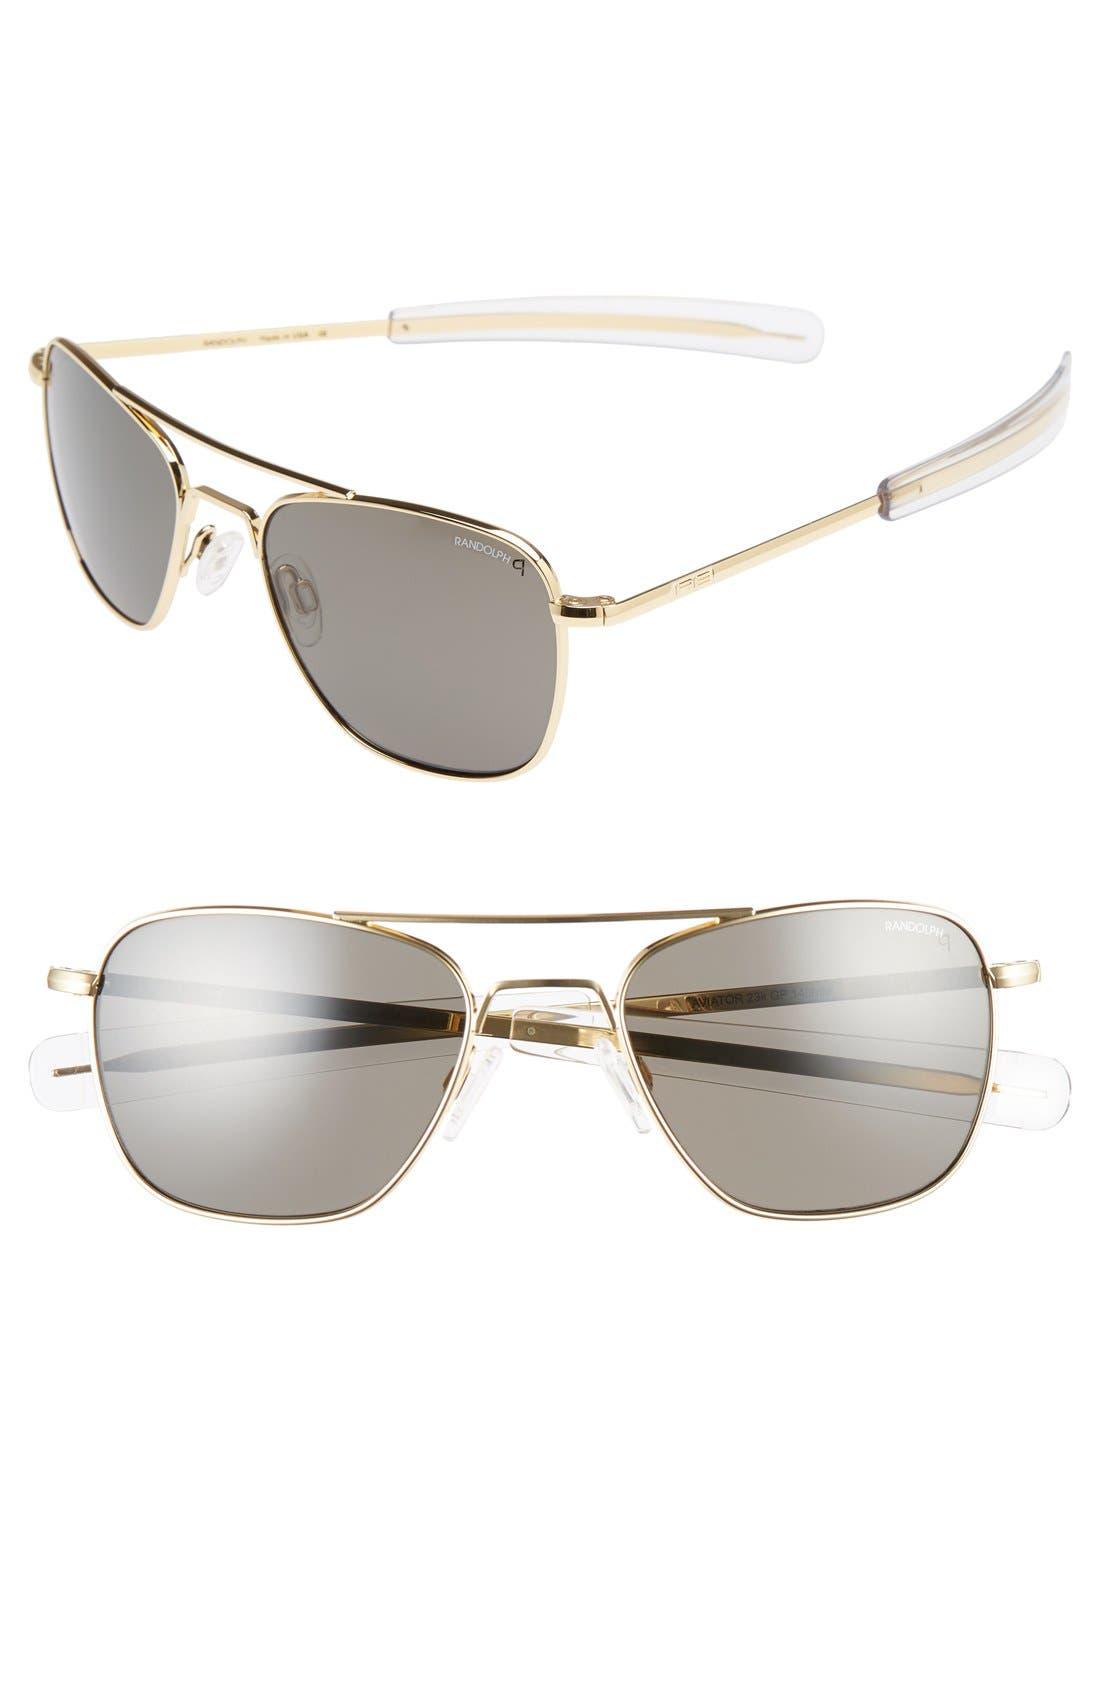 52mm Polarized Aviator Sunglasses,                         Main,                         color, 711